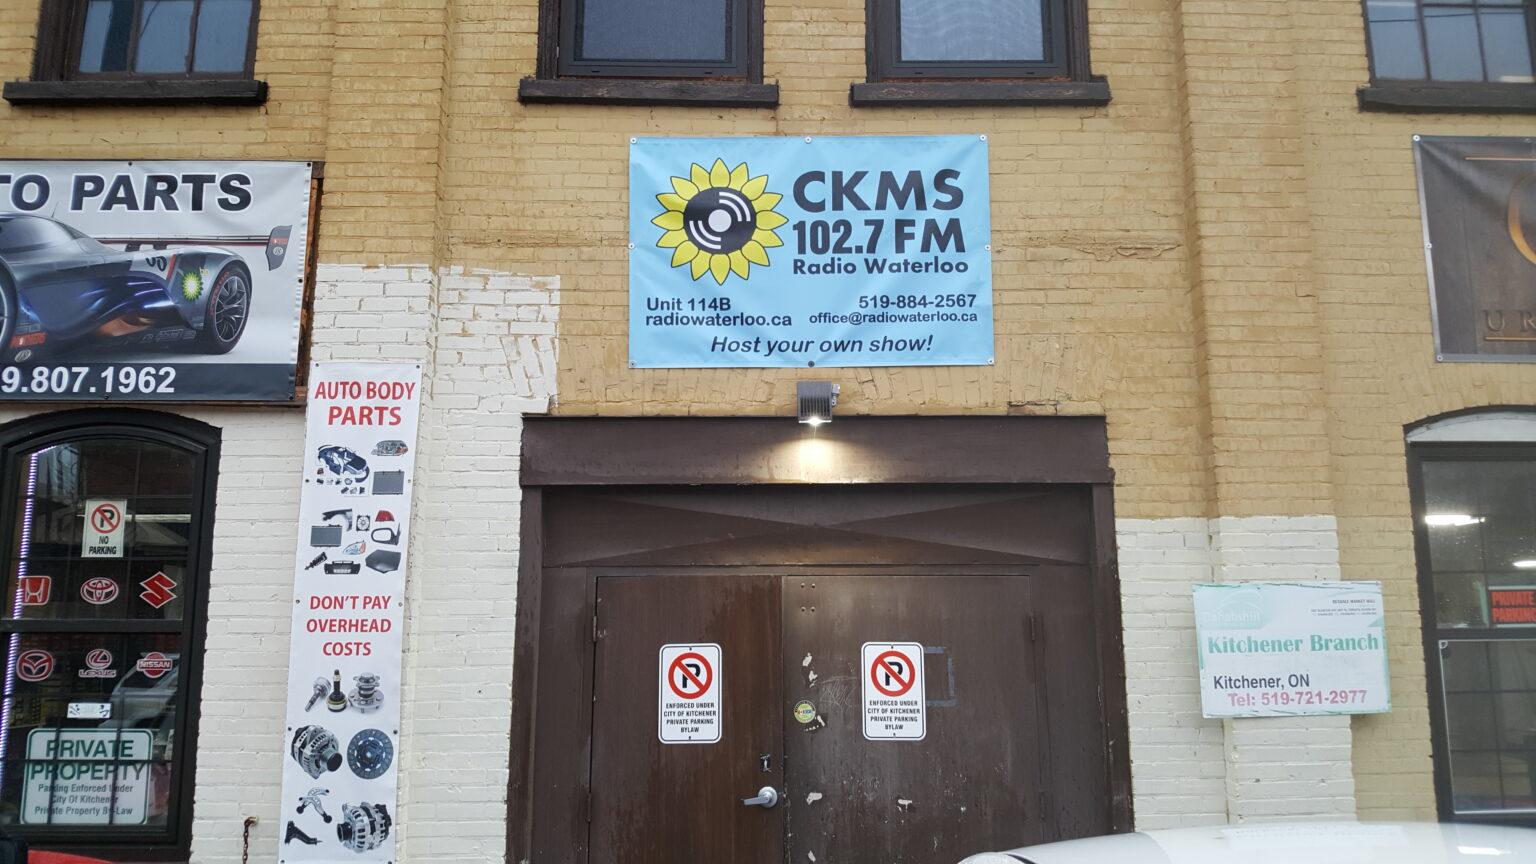 The CKMS 102.7 FM Radio Waterloo banner over the doors!